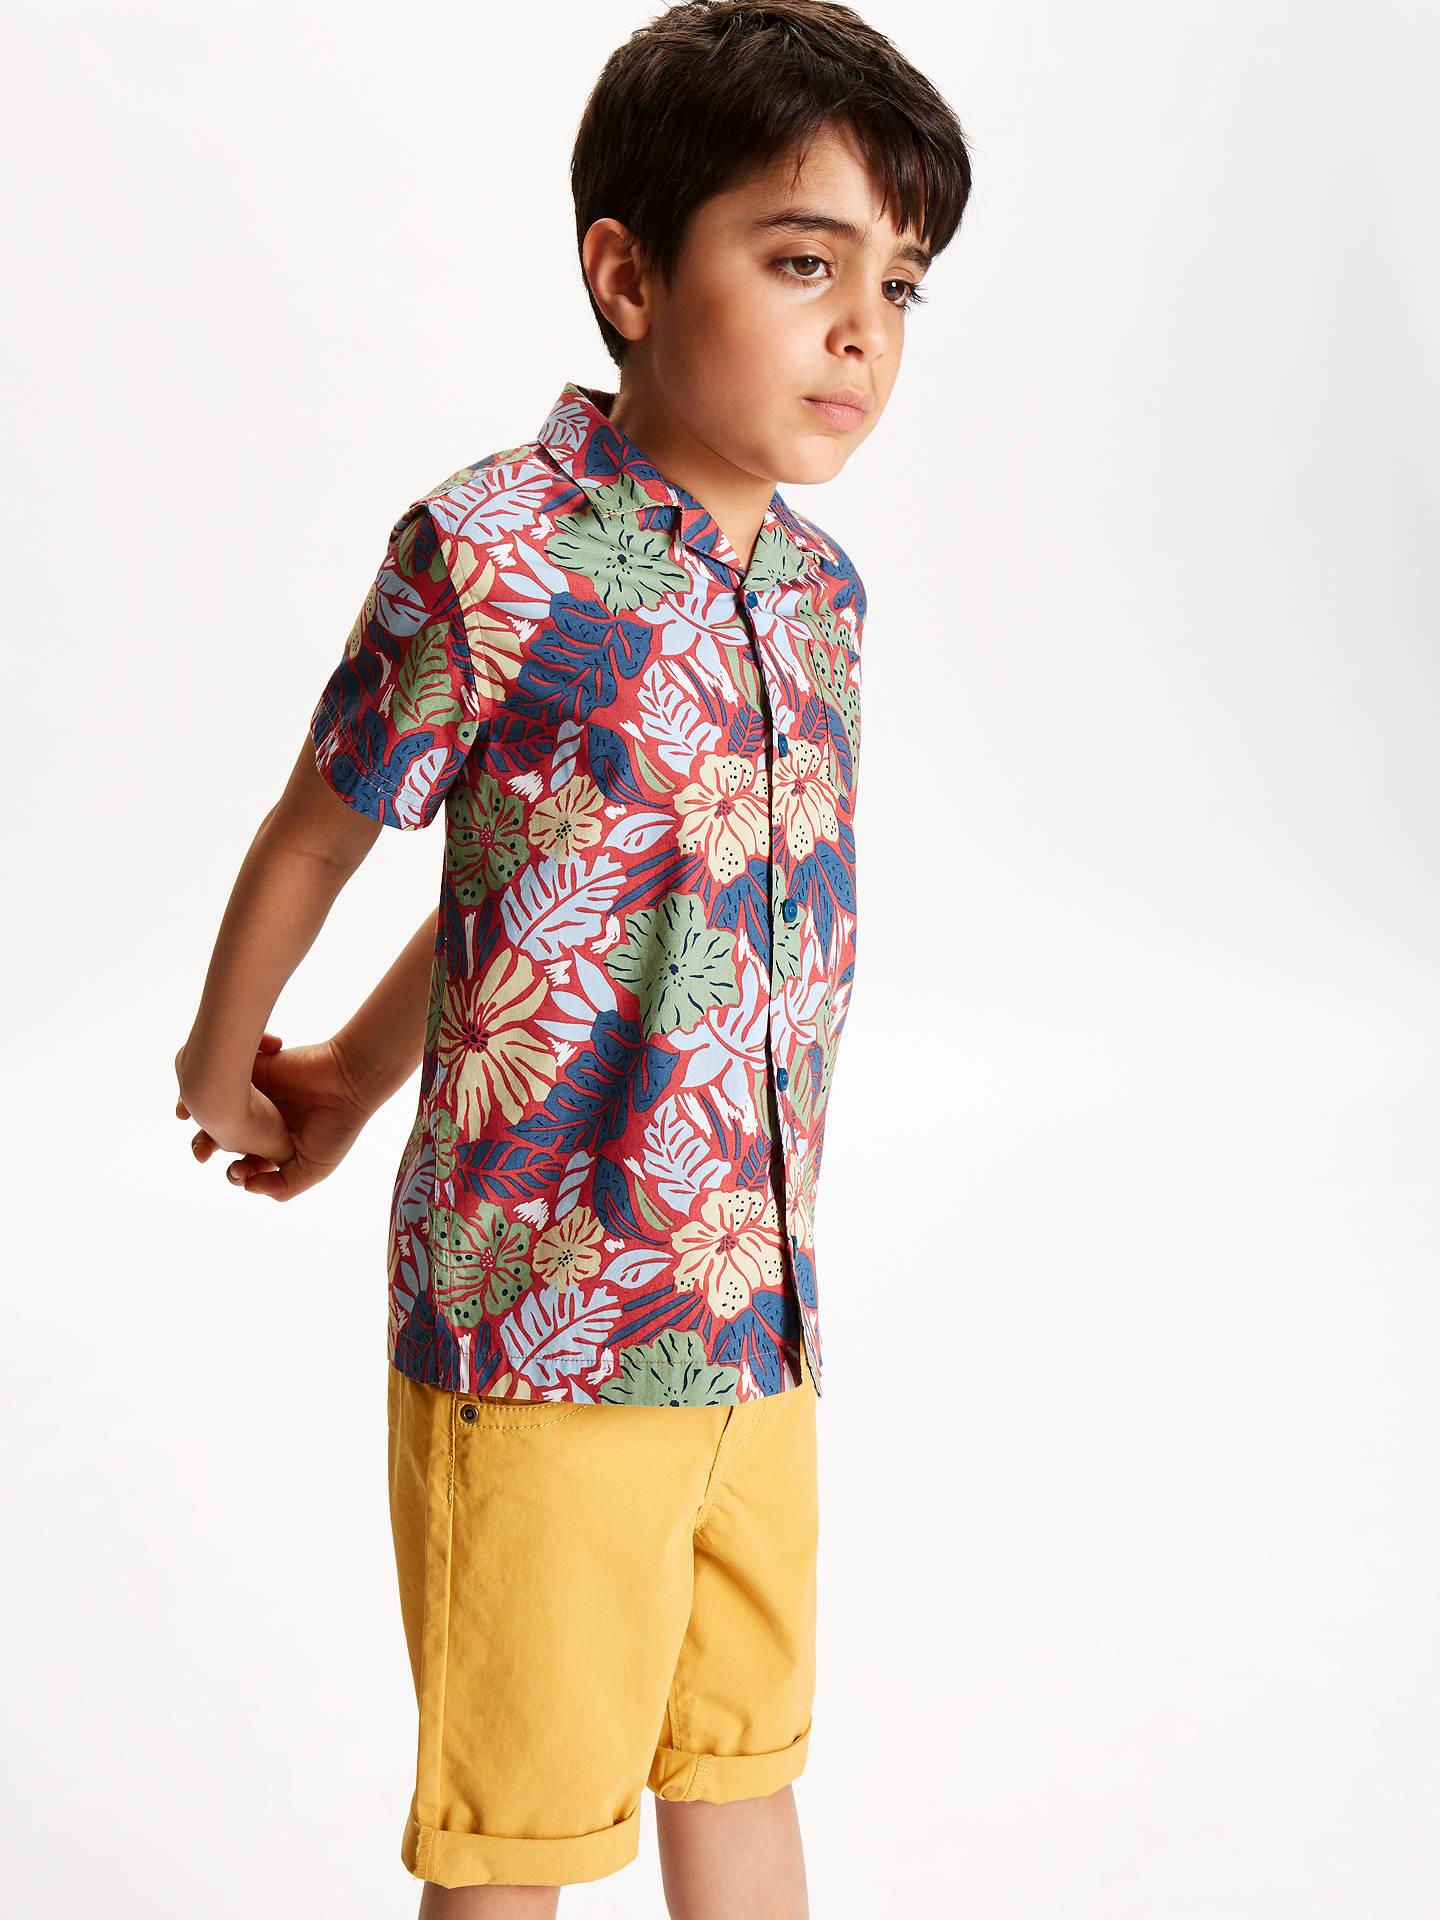 51f120ed9 ... Buy John Lewis & Partners Boys' Vintage Floral Shirt, Blue, 2 years  Online ...